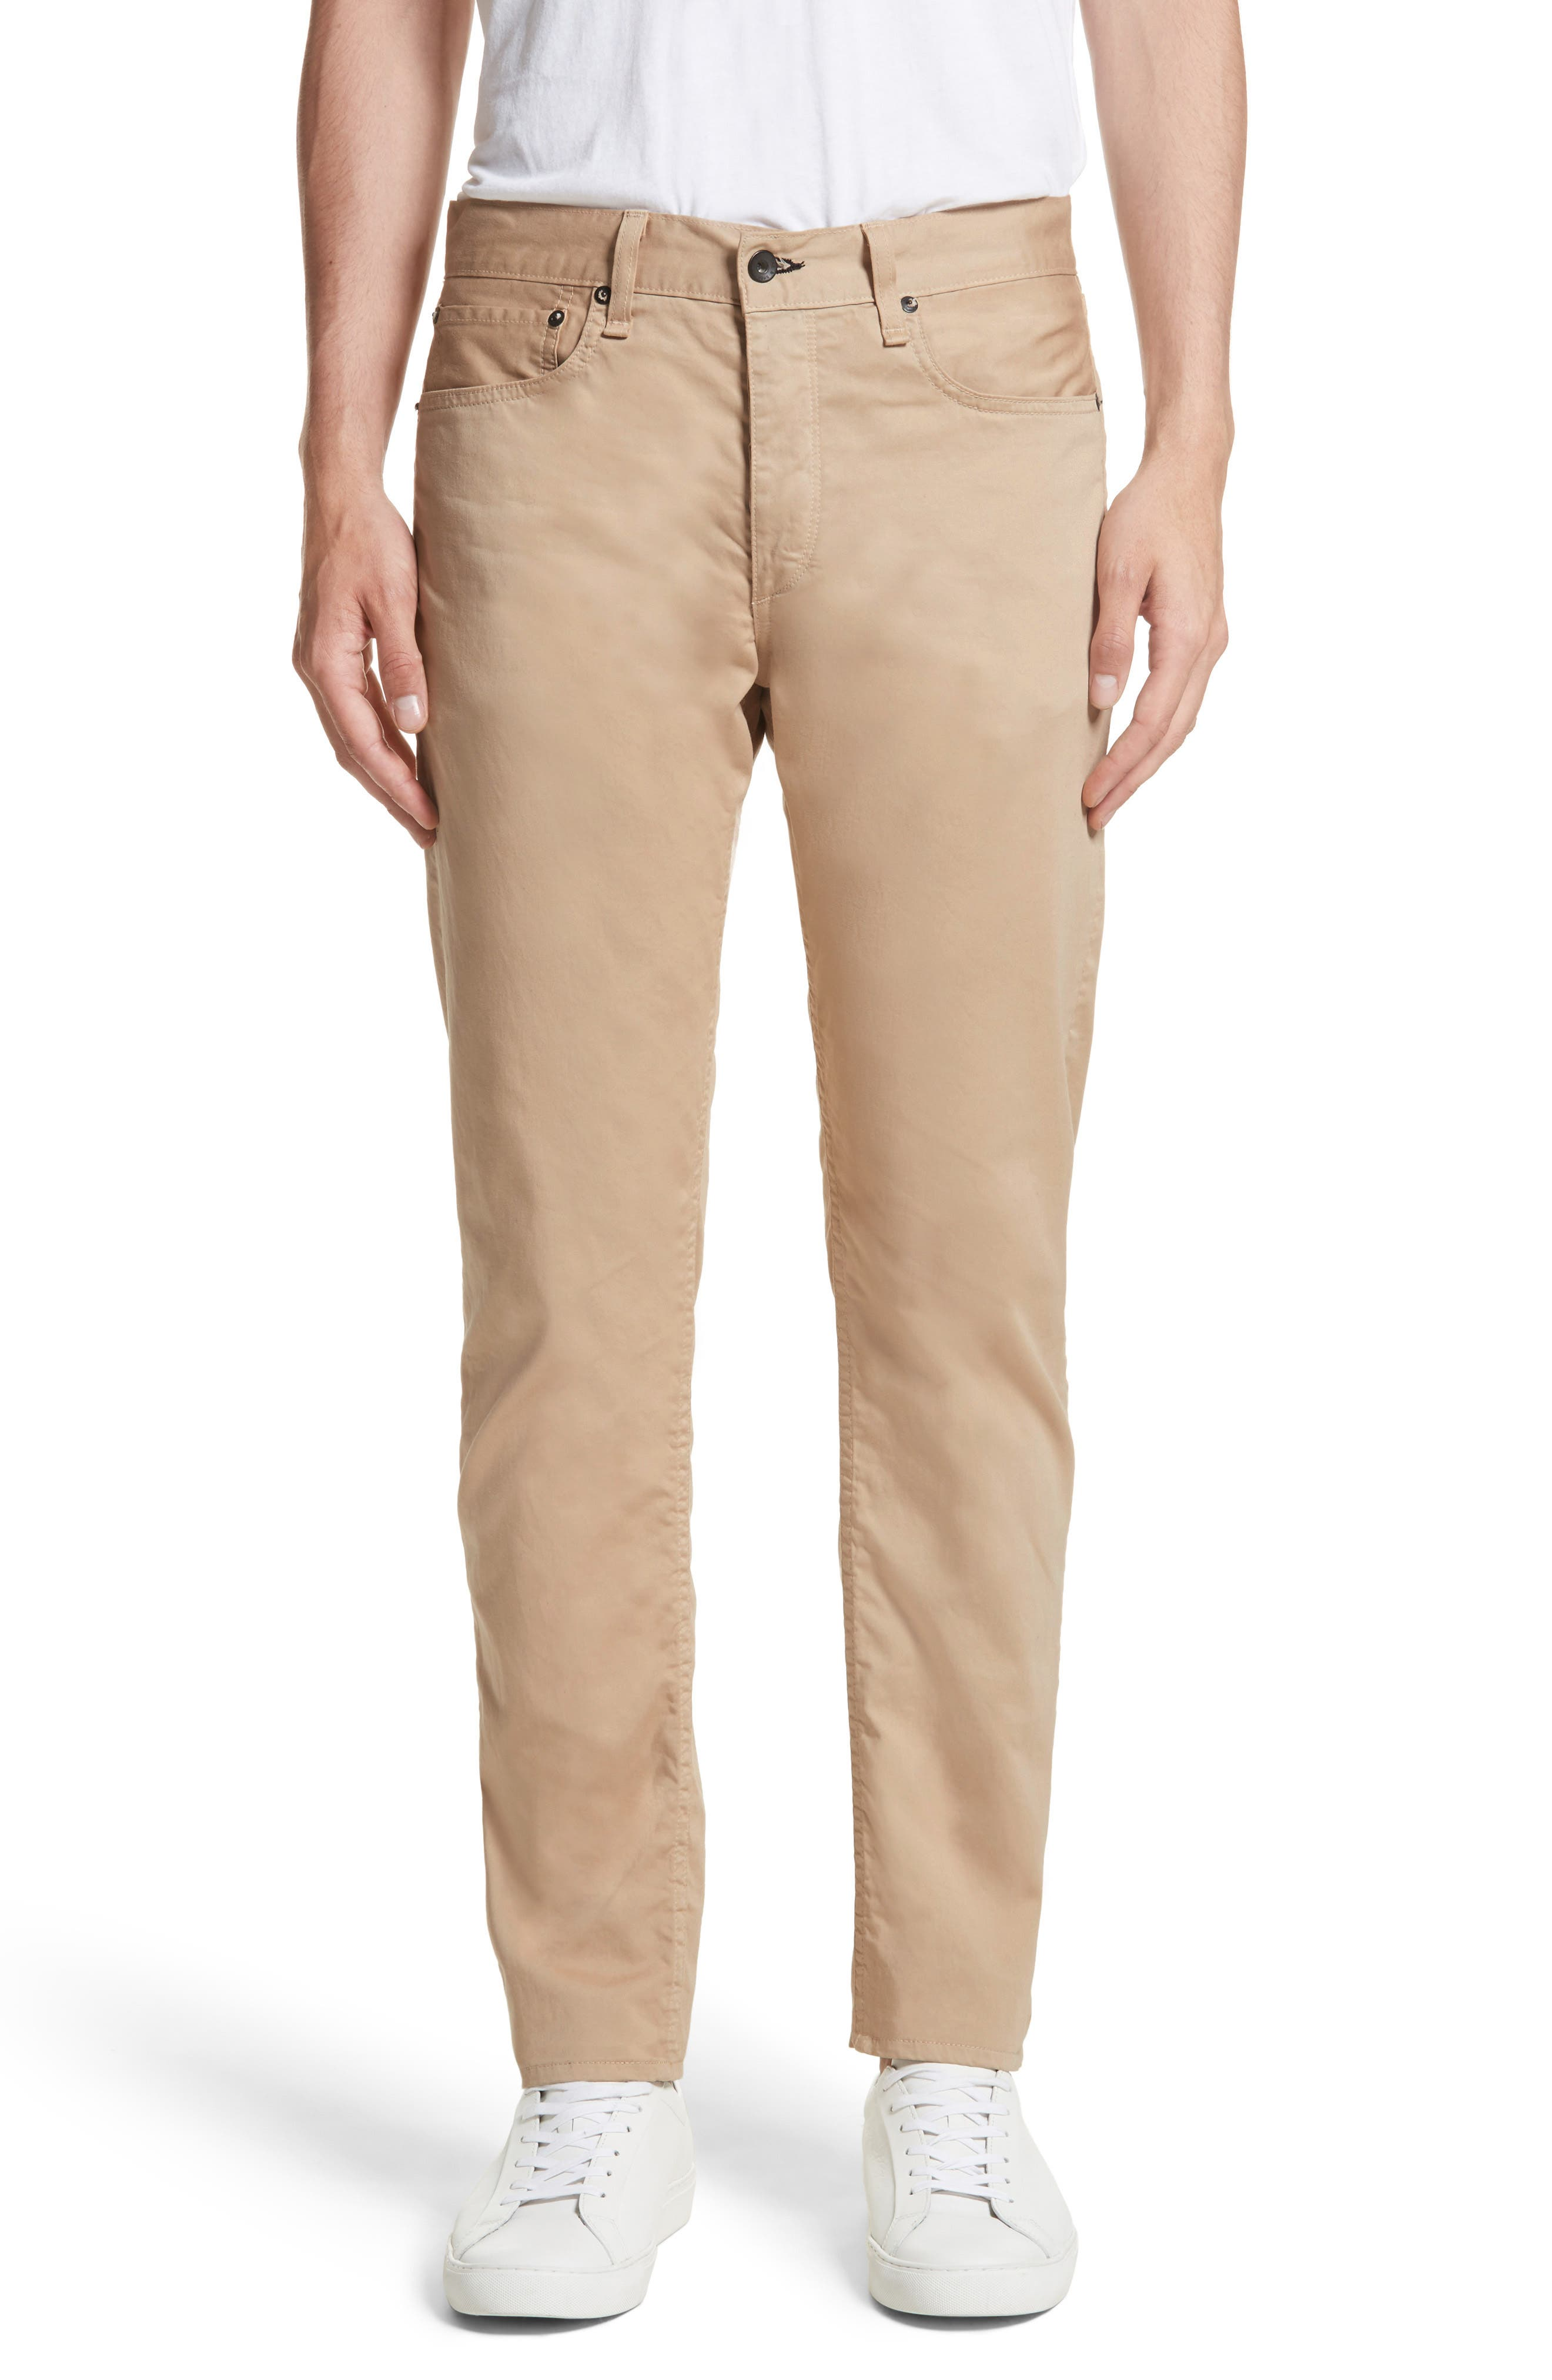 Fit 2 Five-Pocket Twill Pants,                             Main thumbnail 1, color,                             BEIGE